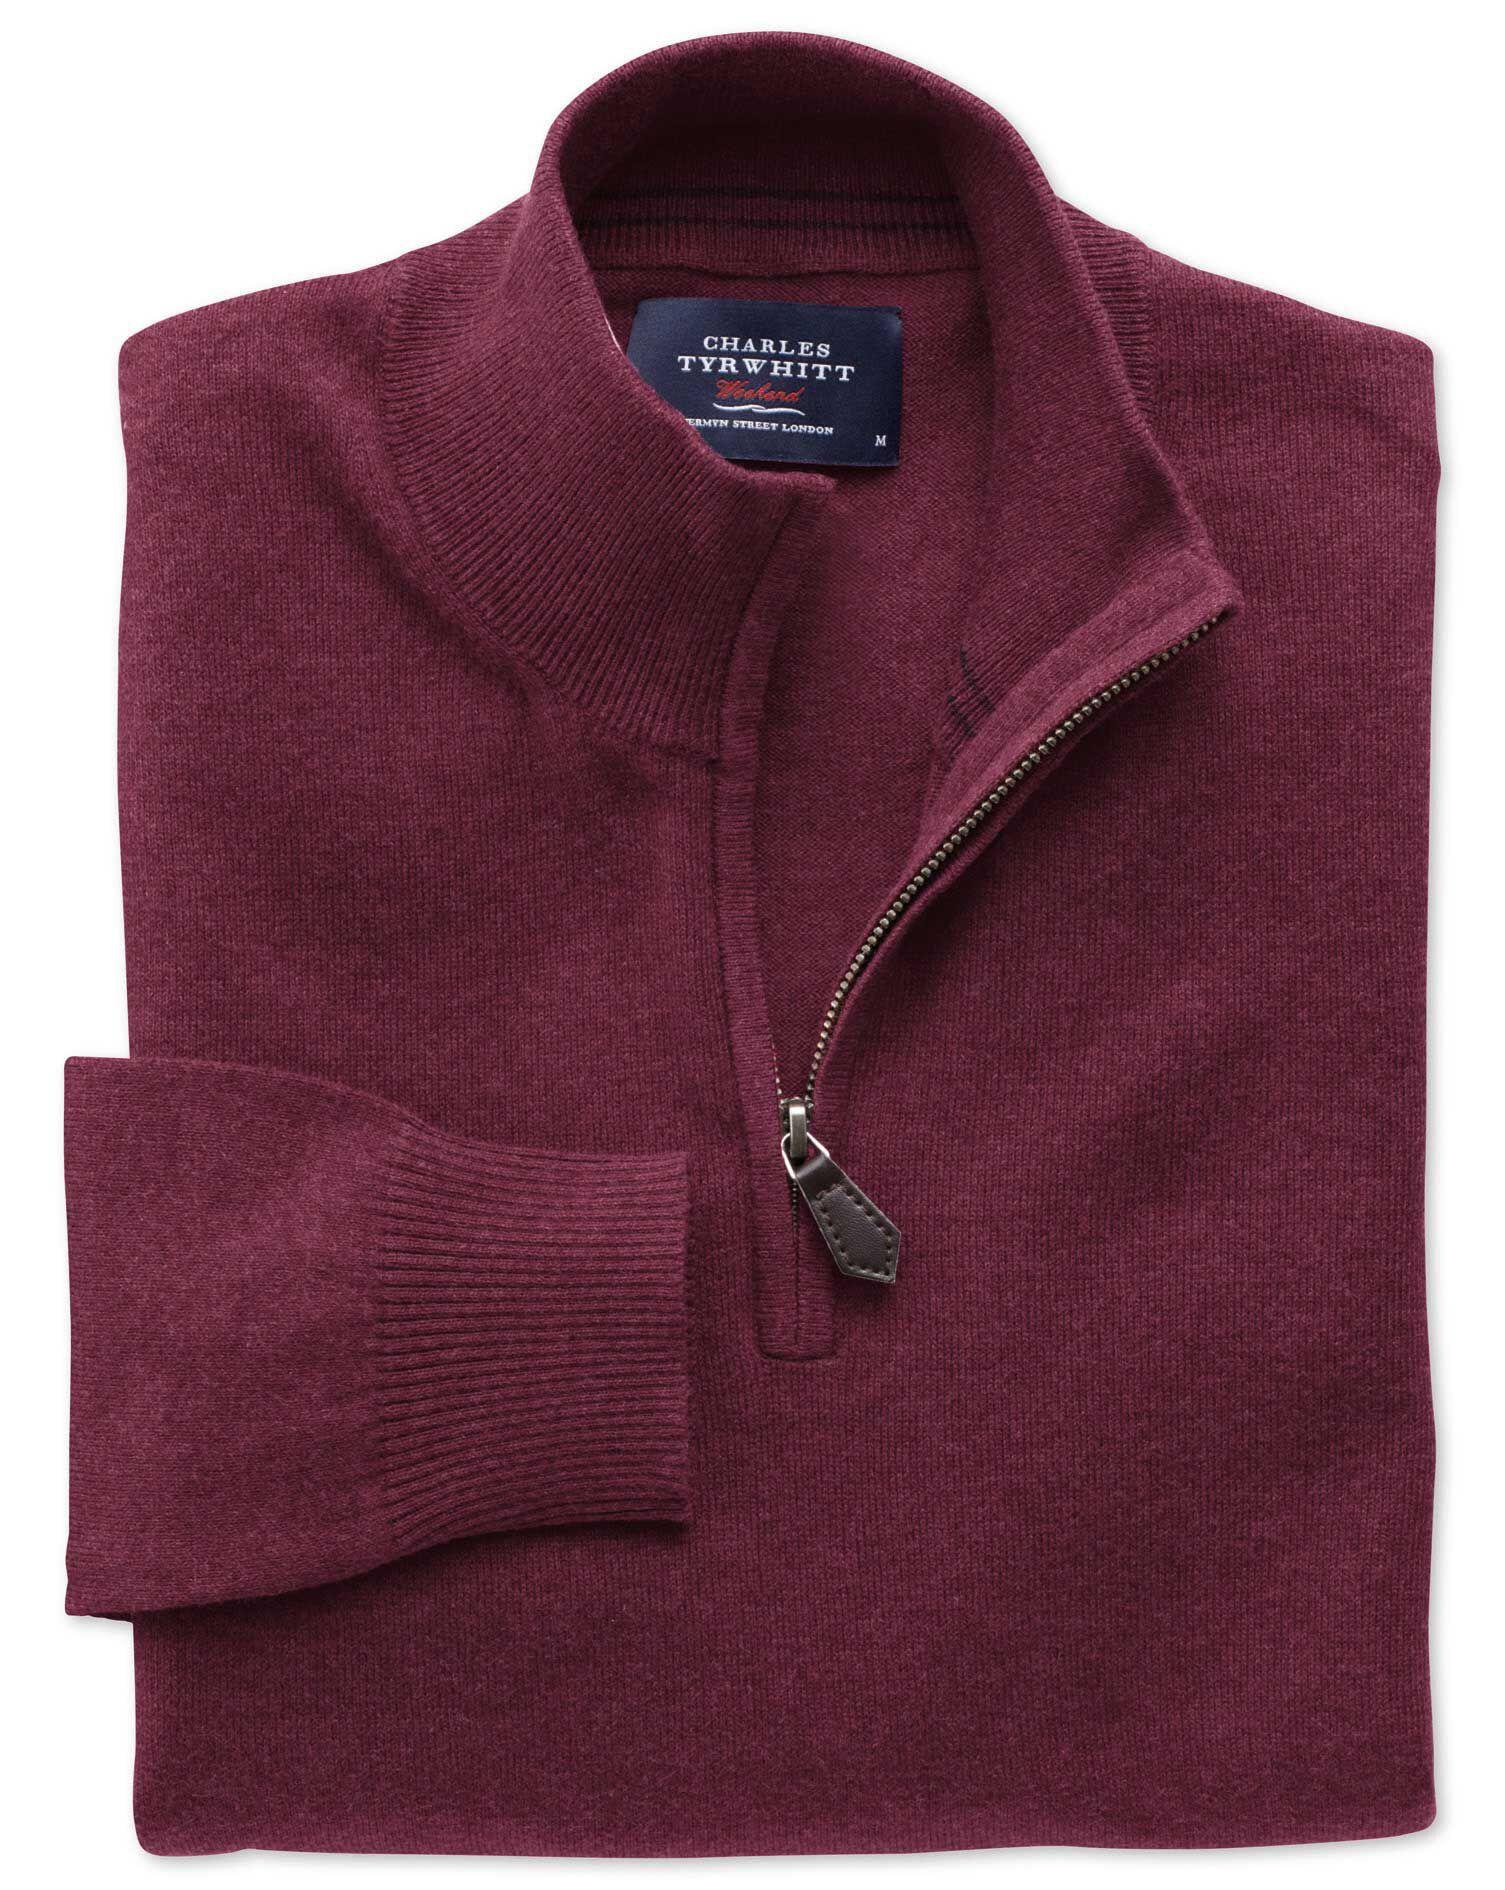 Wine Cotton Cashmere Zip Neck Jumper Size XS by Charles Tyrwhitt